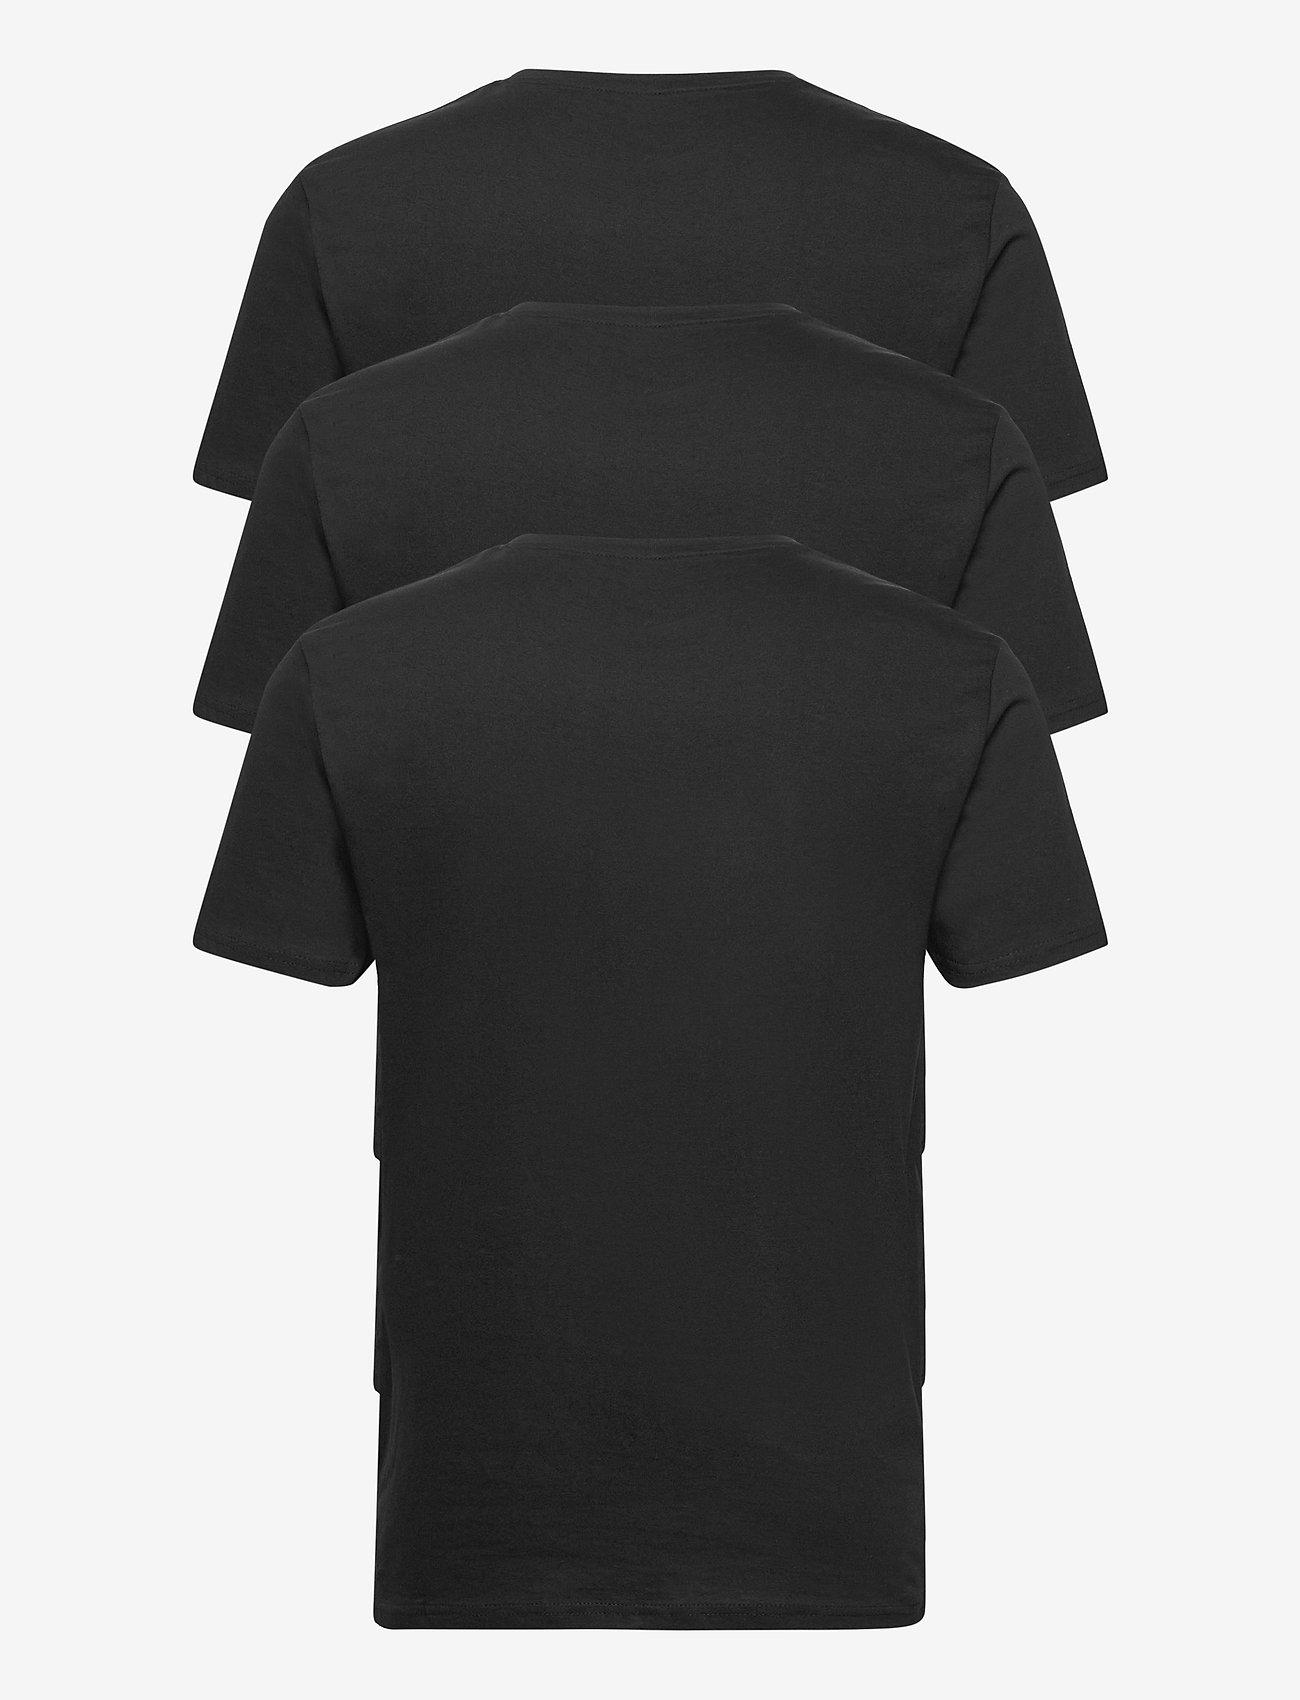 Denim project - 3 PACK T-SHIRTS - basic t-shirts - black - 1